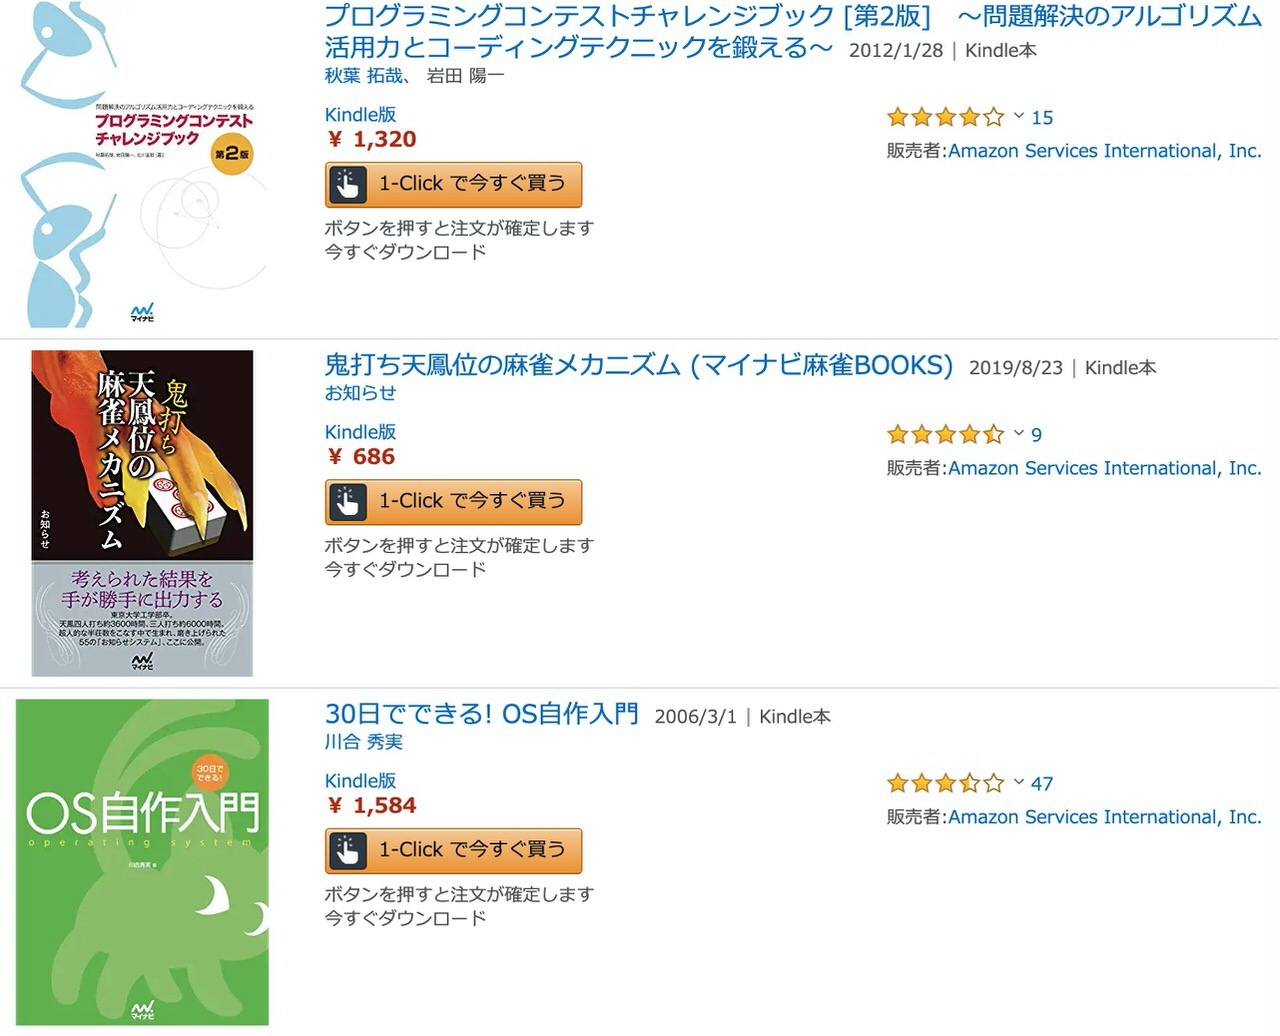 【Kindleセール】1,000冊以上が対象「Kindleストア7周年記念セール:マイナビ出版タイトル」